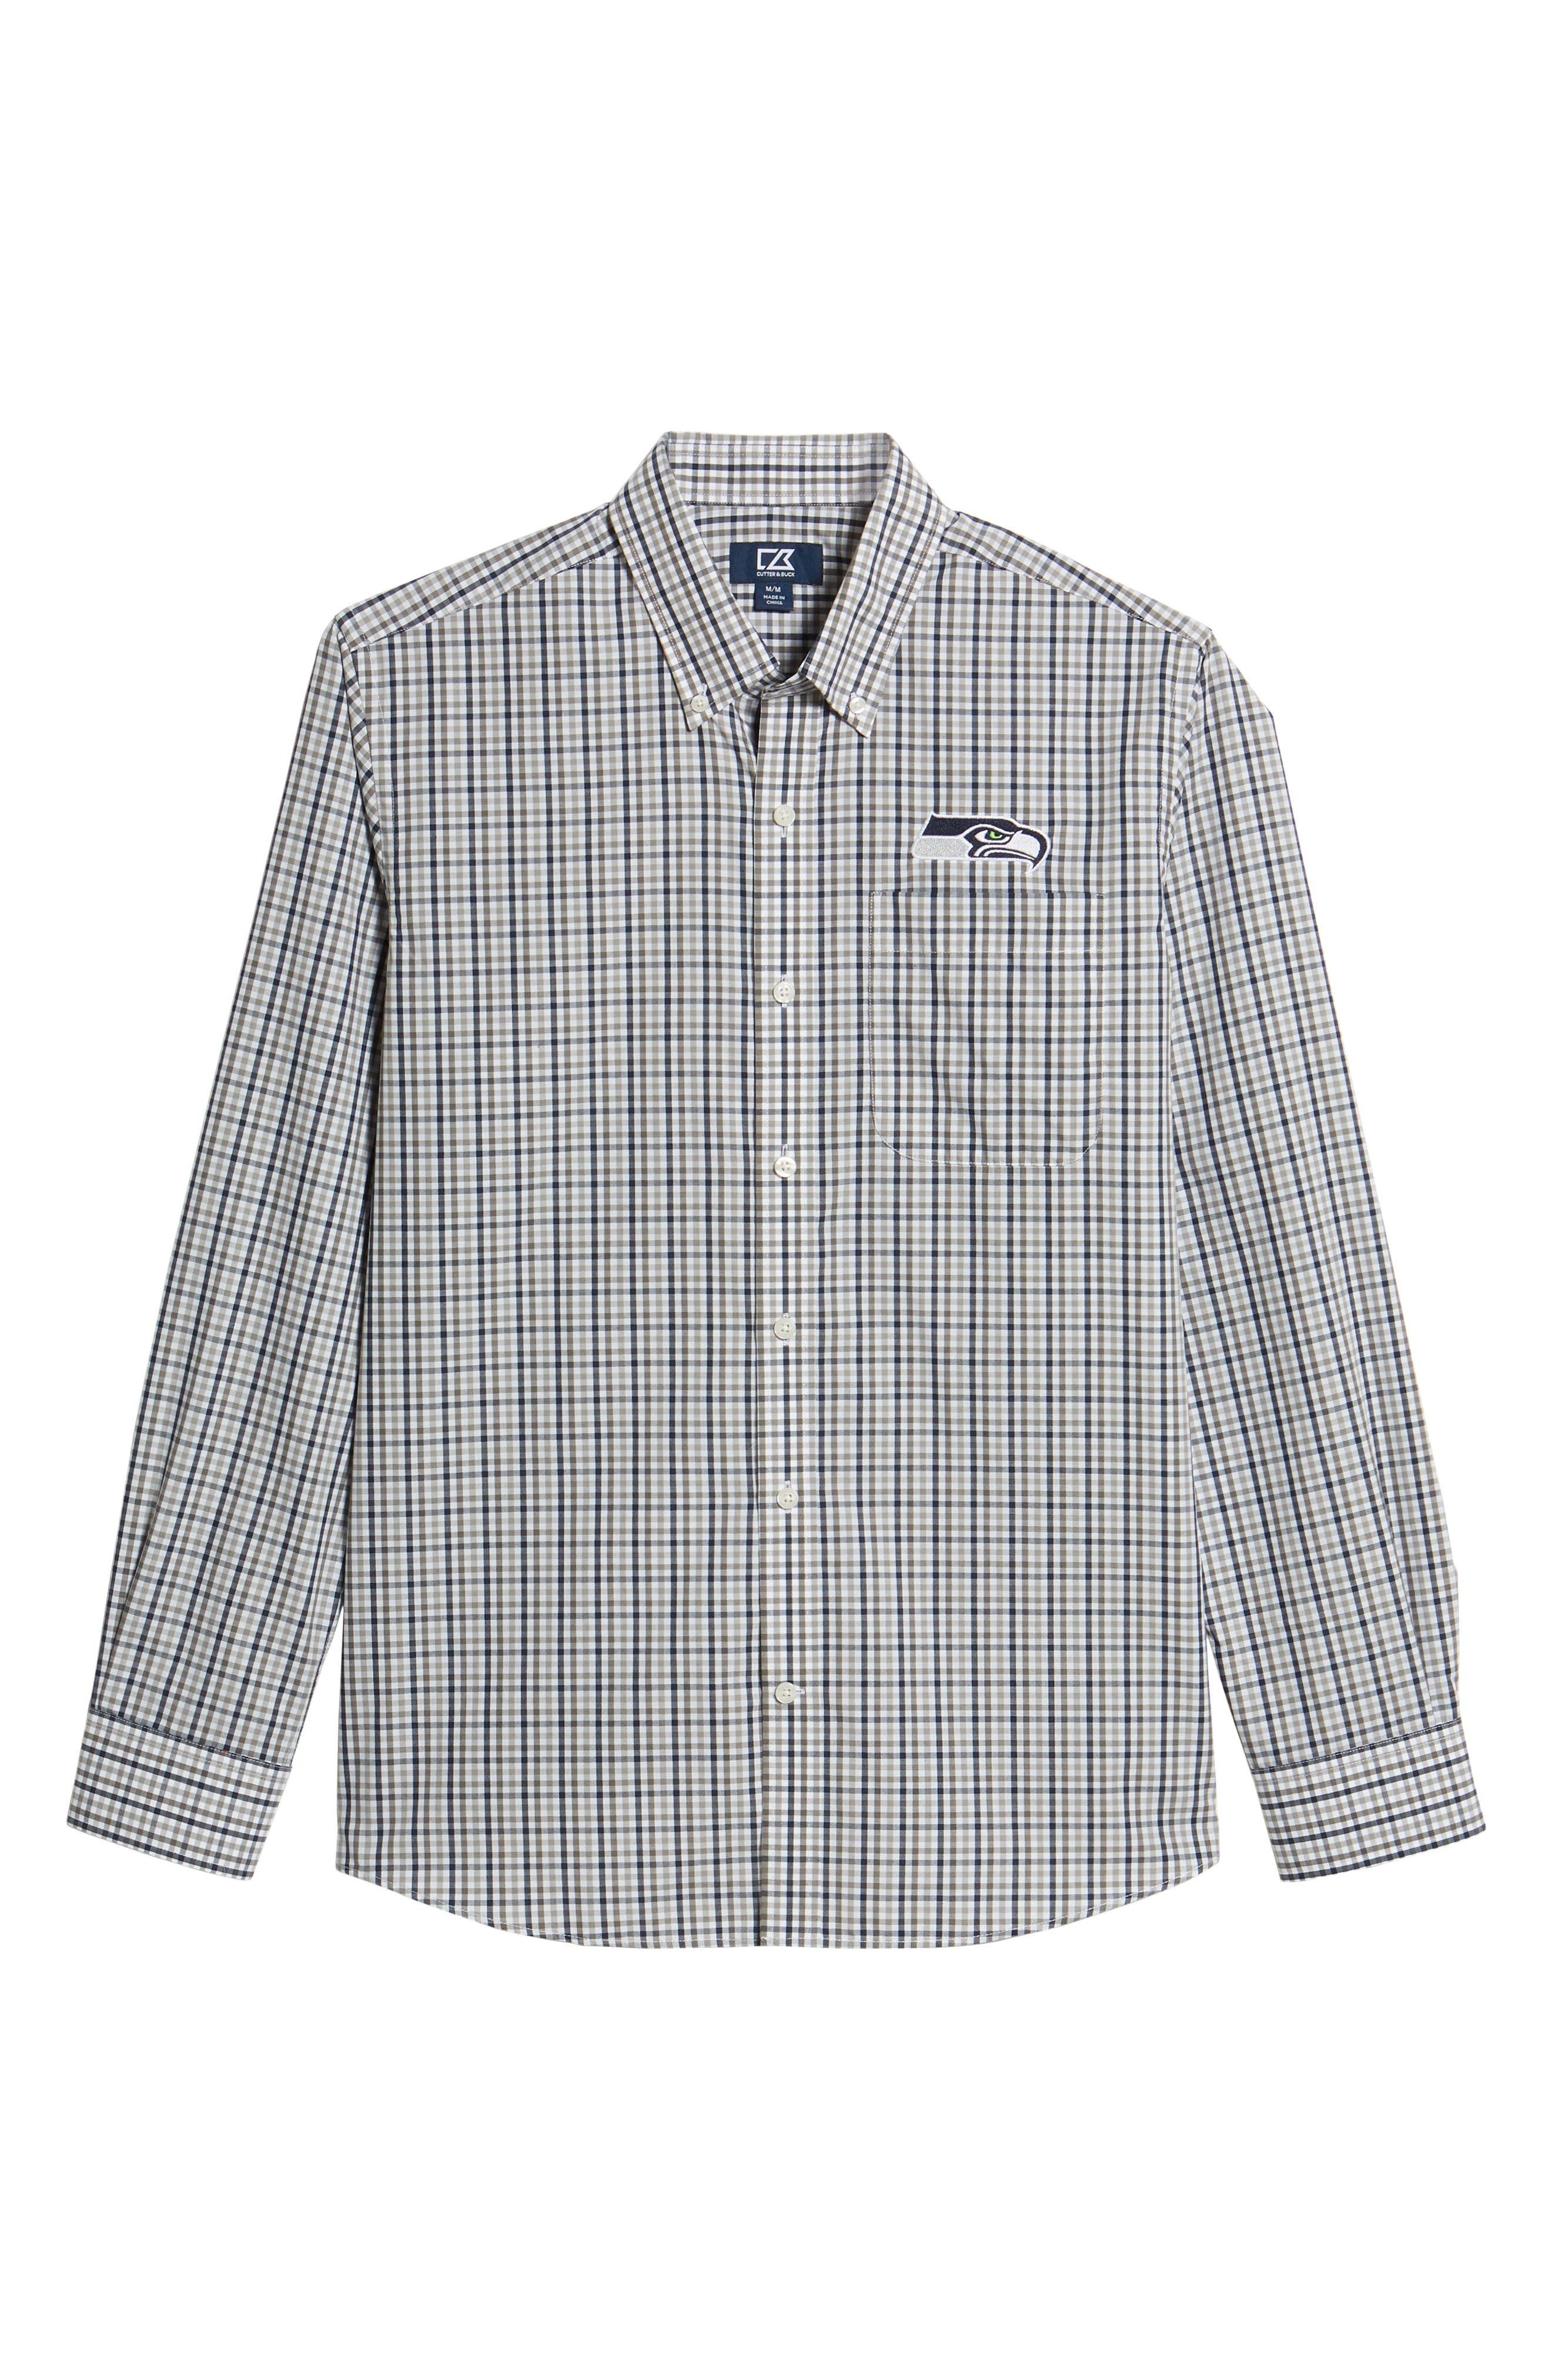 Seattle Seahawks - Gilman Regular Fit Plaid Sport Shirt,                             Alternate thumbnail 6, color,                             LIBERTY NAVY